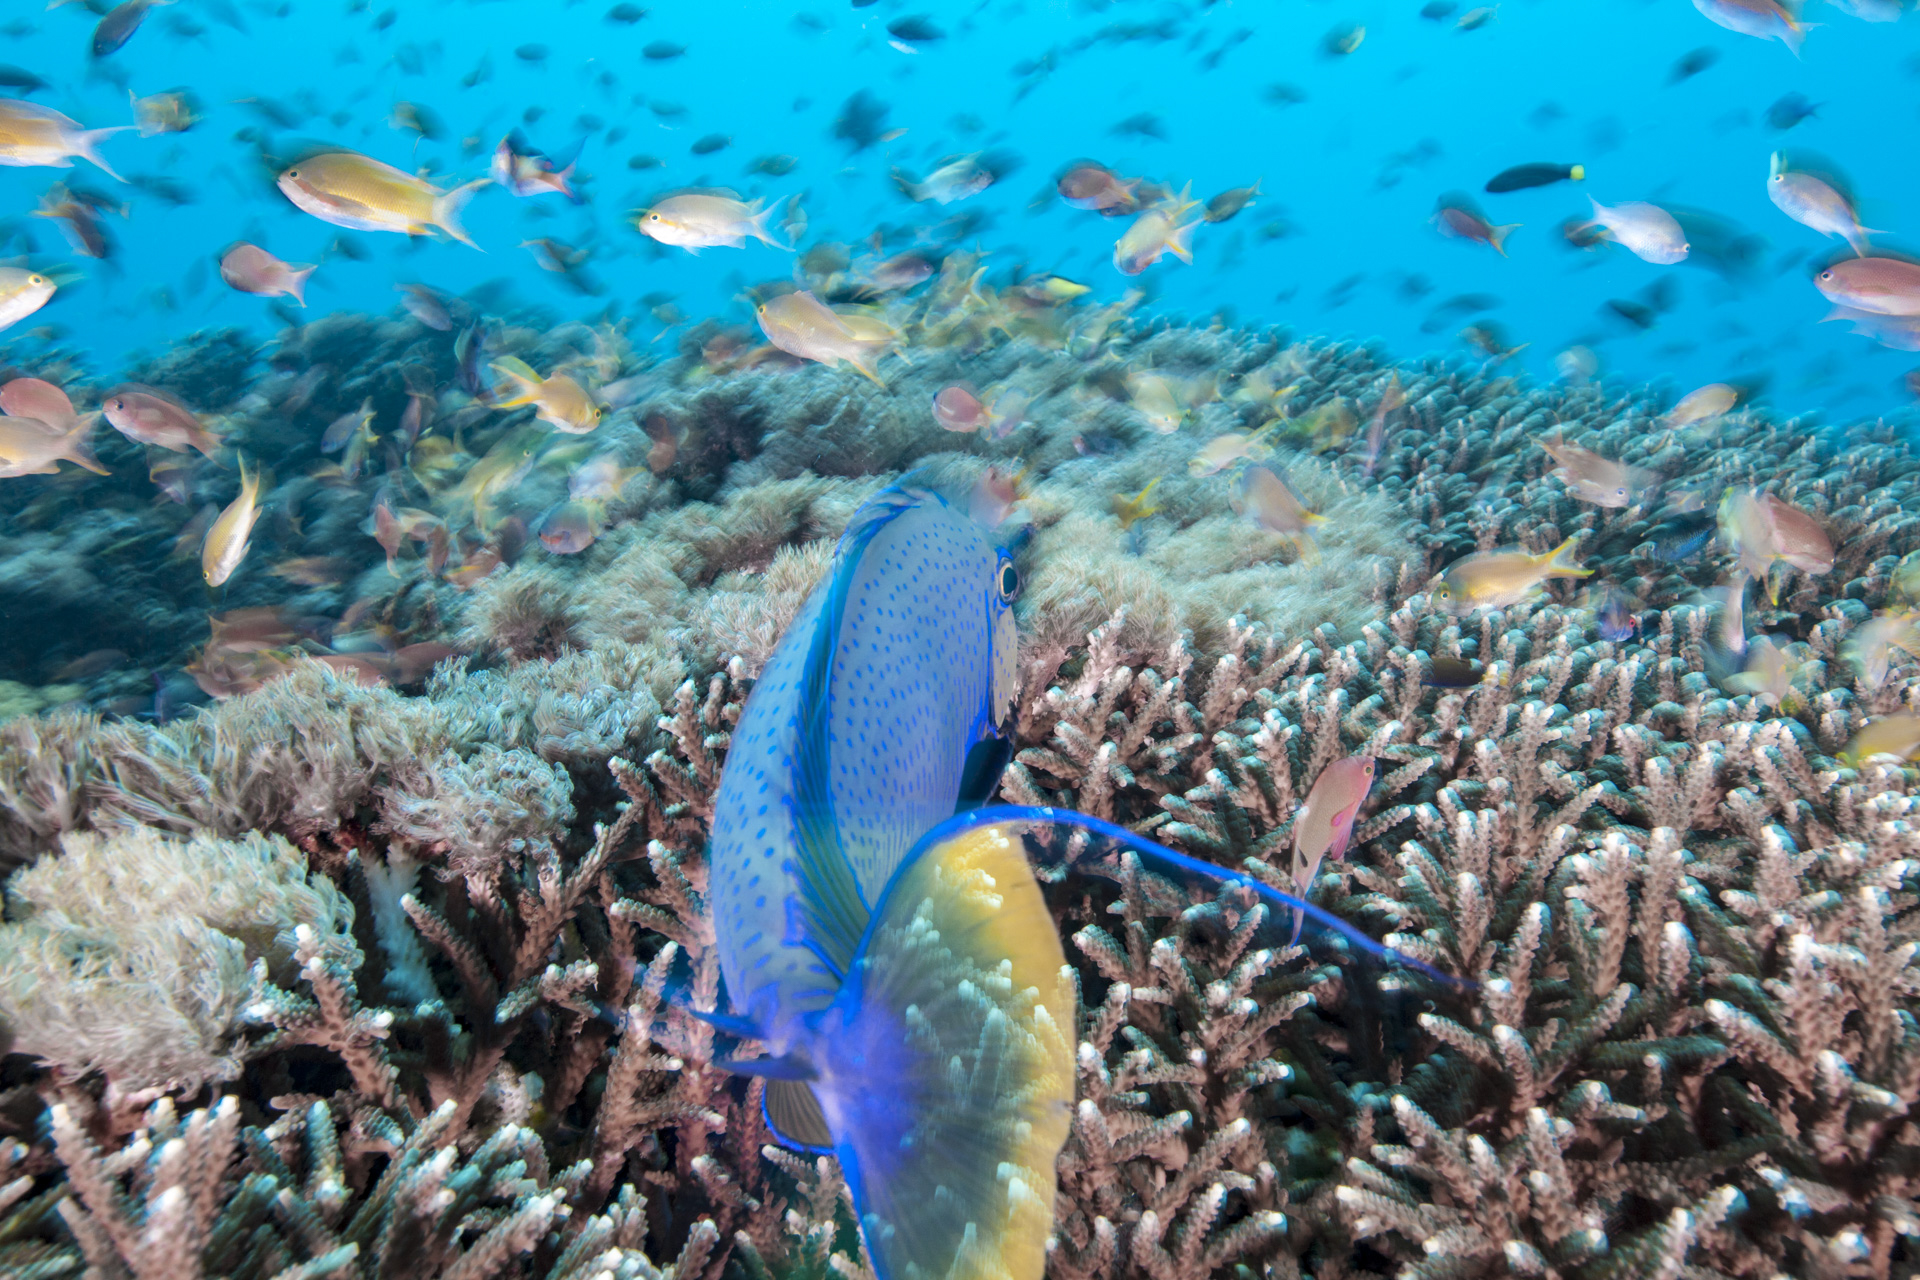 unicorn fish, bali david p. robinson, phd / coral reef image bank